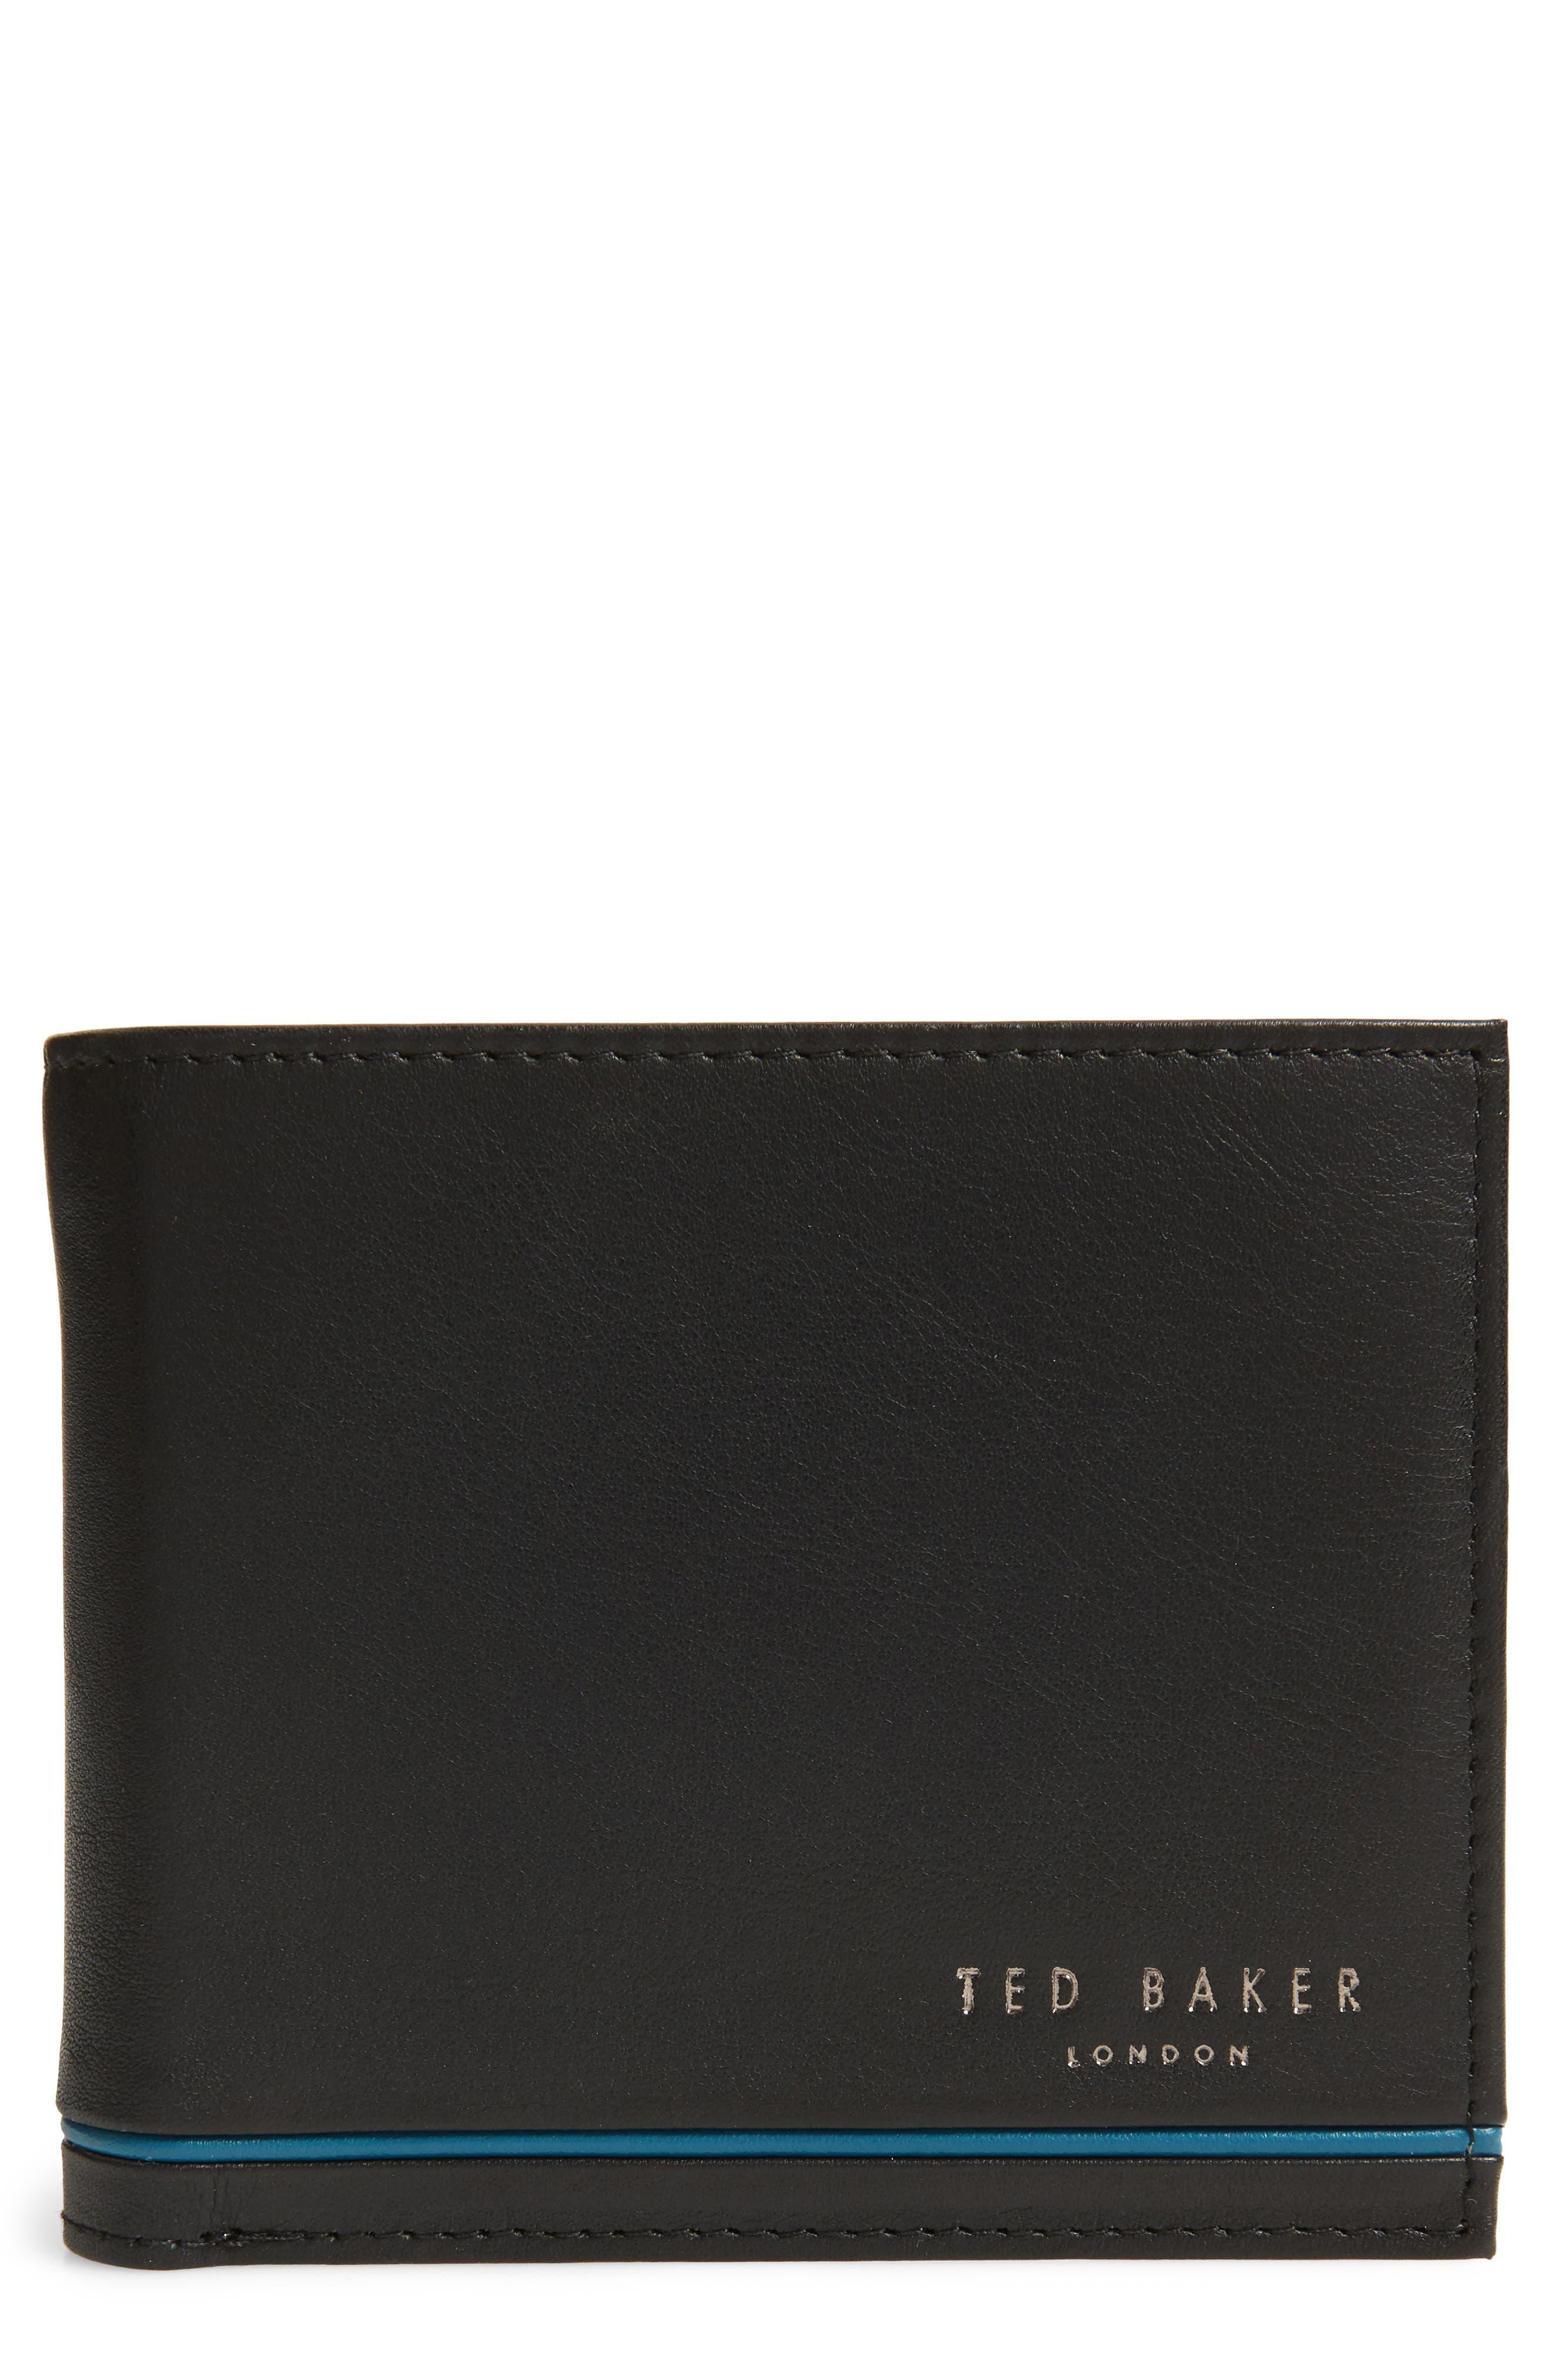 Dooree Leather Wallet,                             Main thumbnail 1, color,                             BLACK